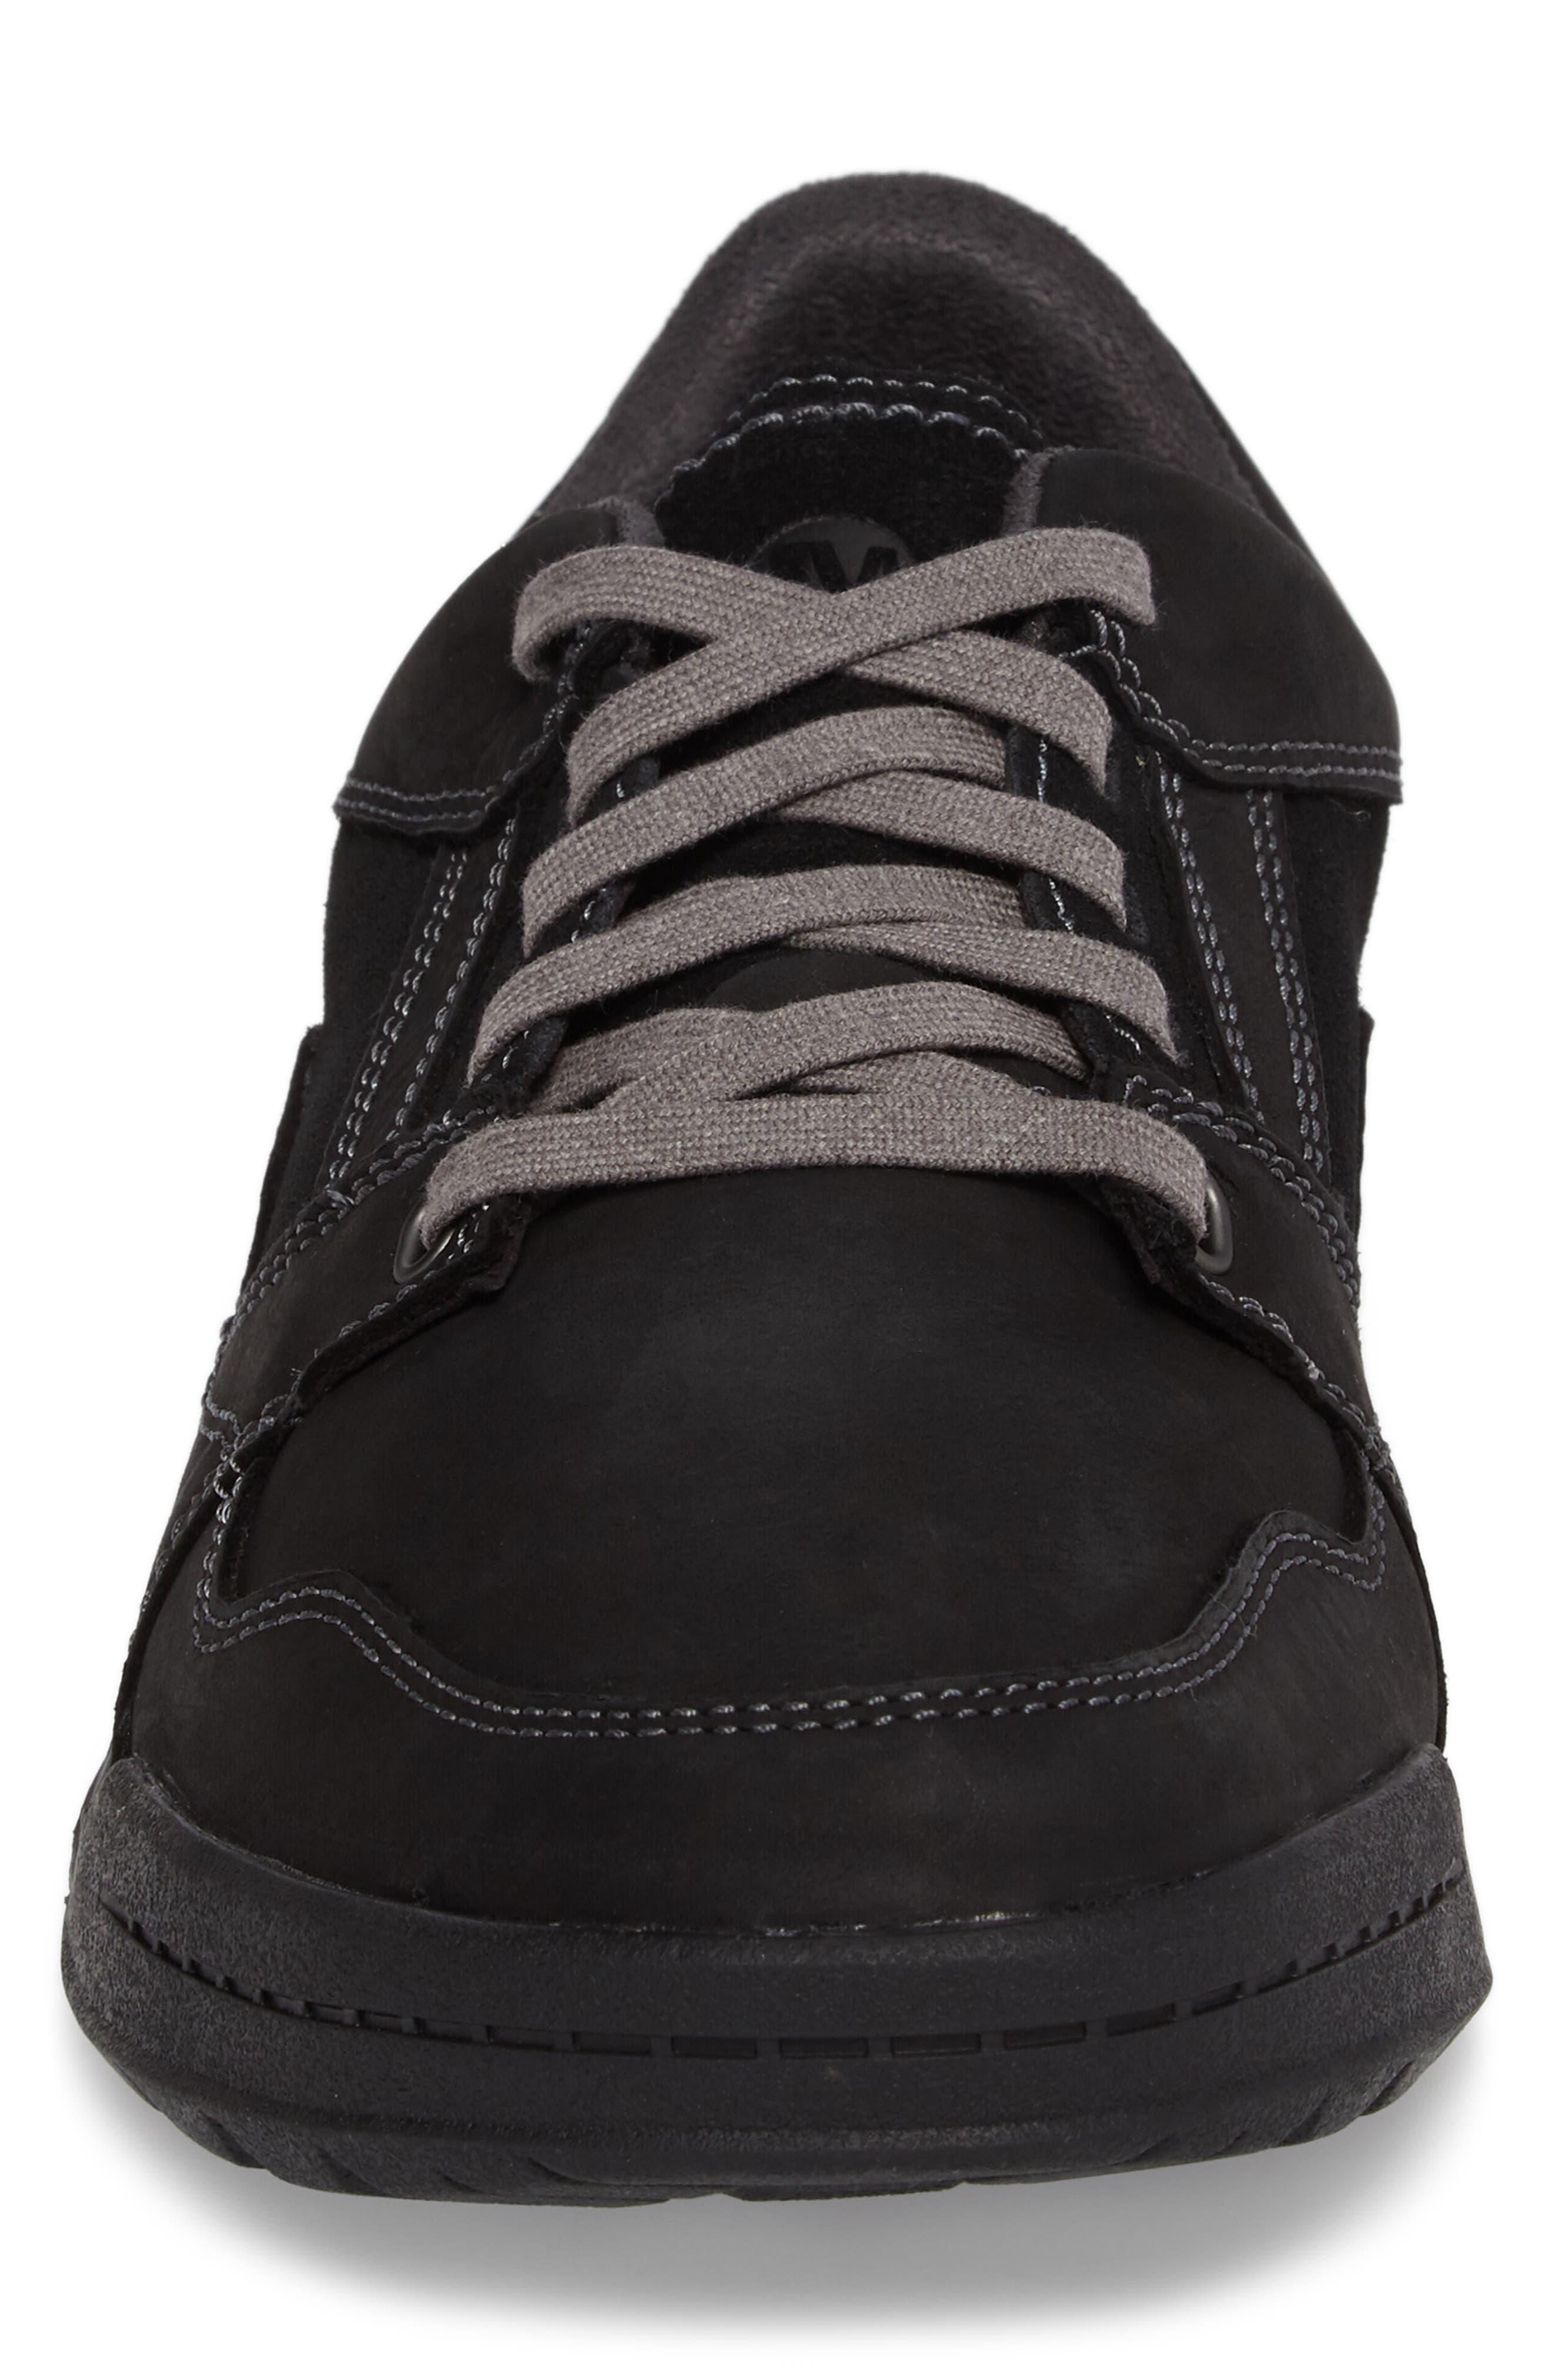 Berner Sneaker,                             Alternate thumbnail 4, color,                             001